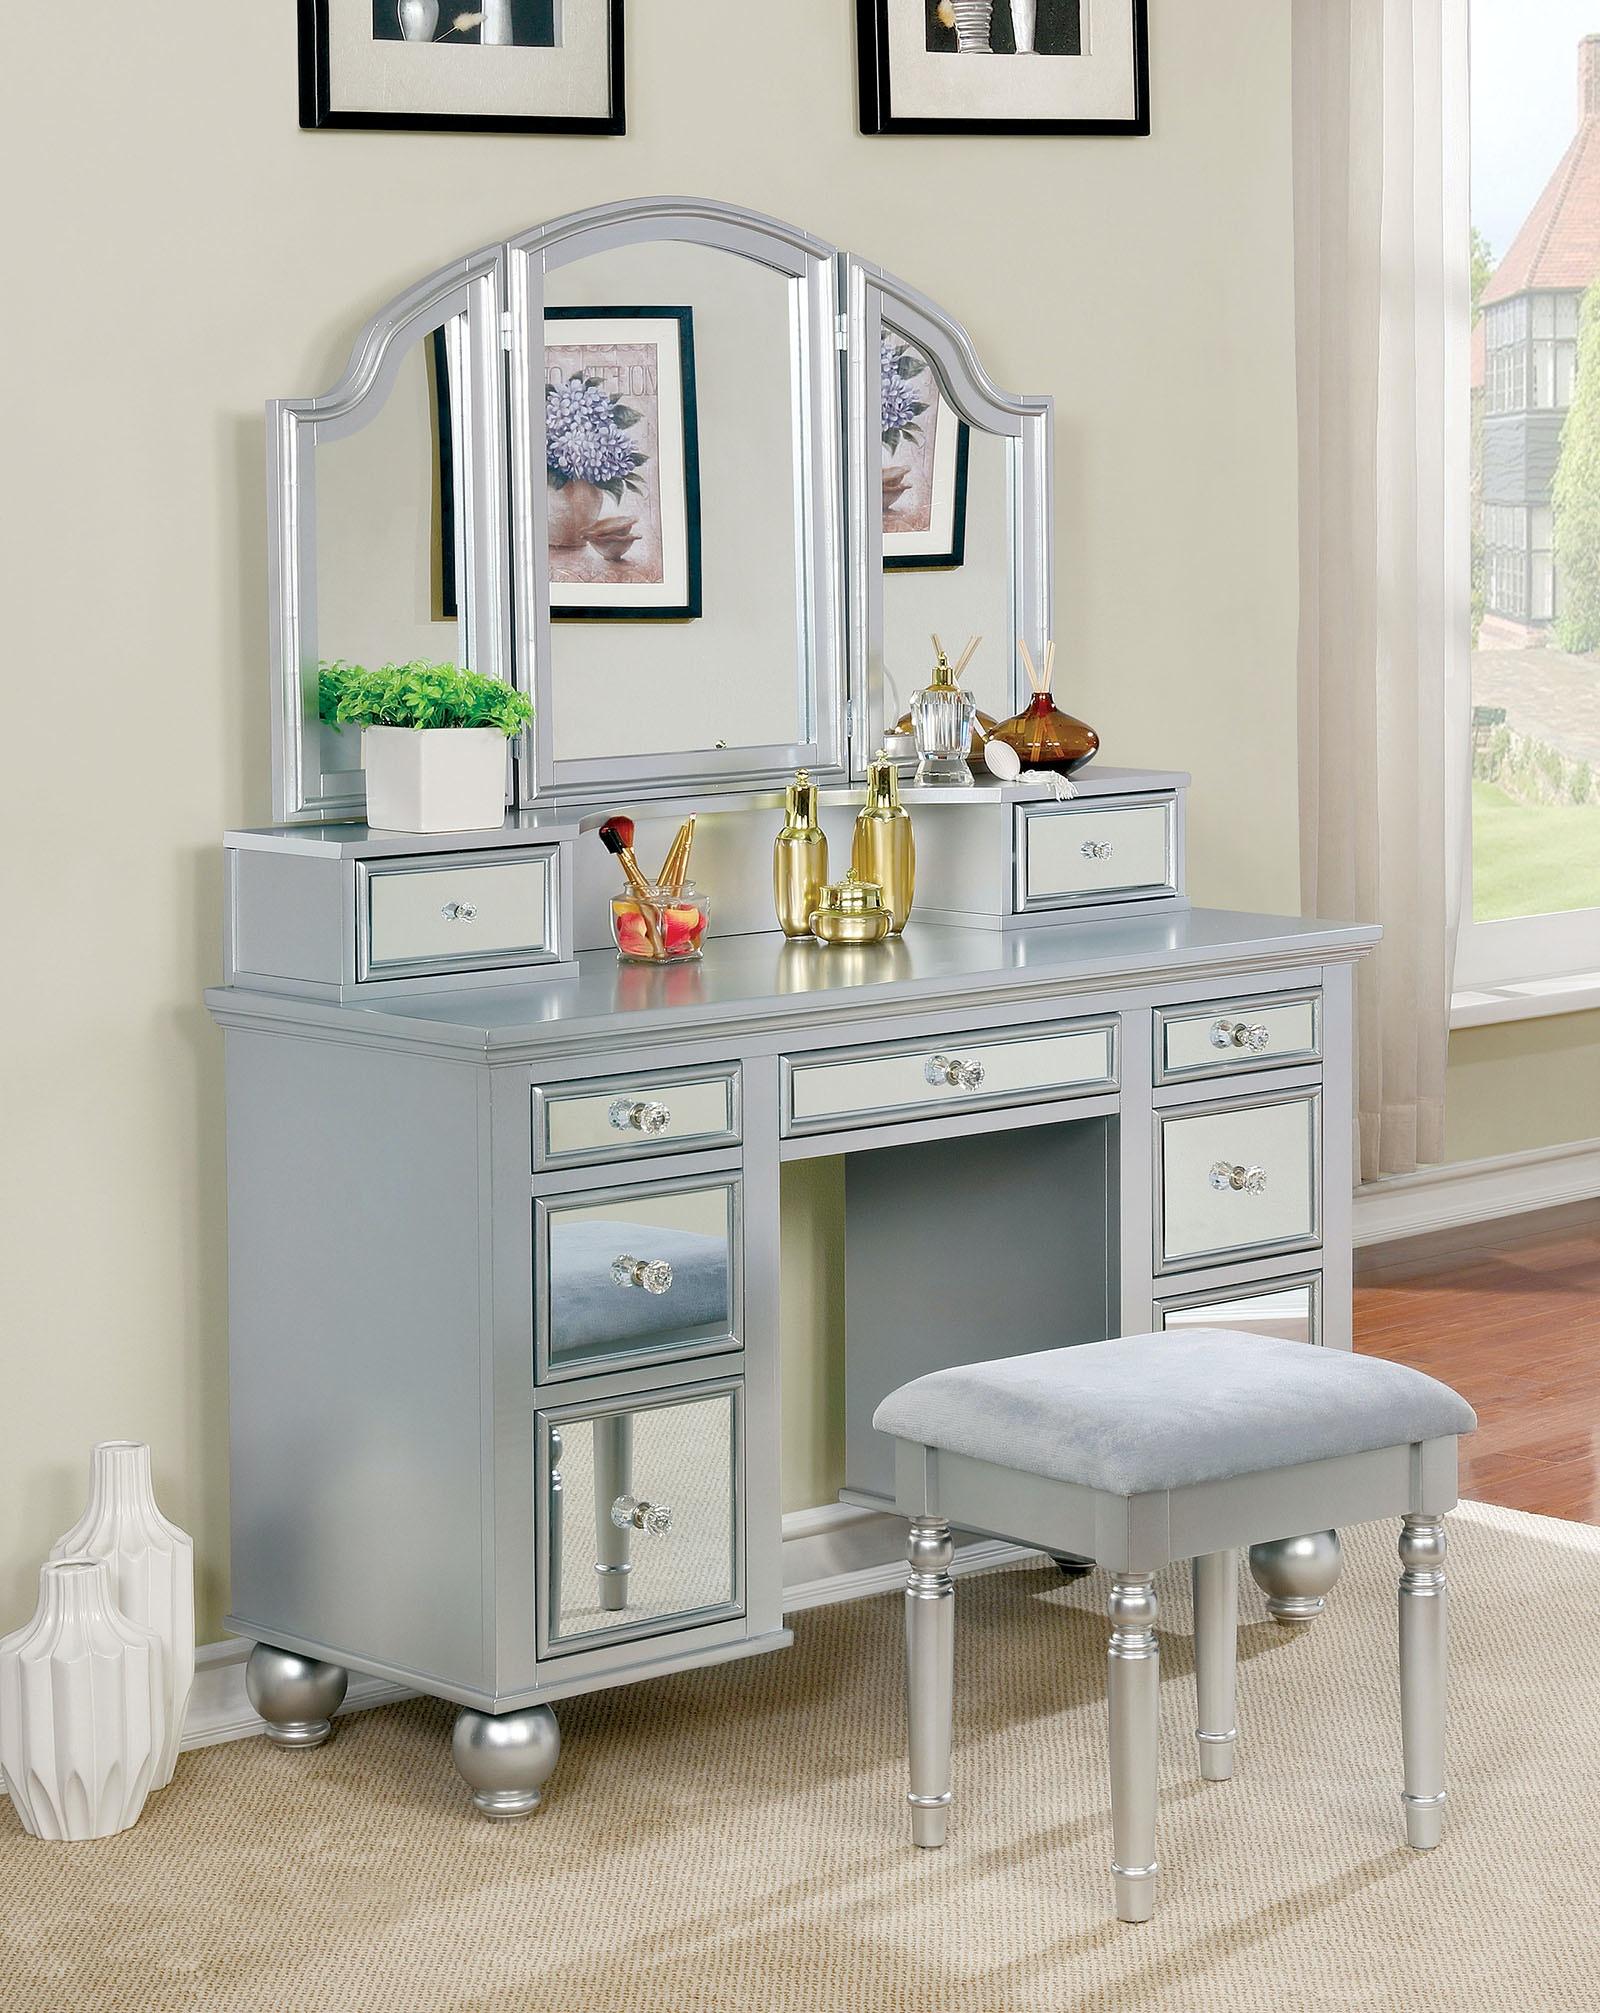 Superb Furniture Of America Vanity W/ Stool, Silver CM DK6162SV